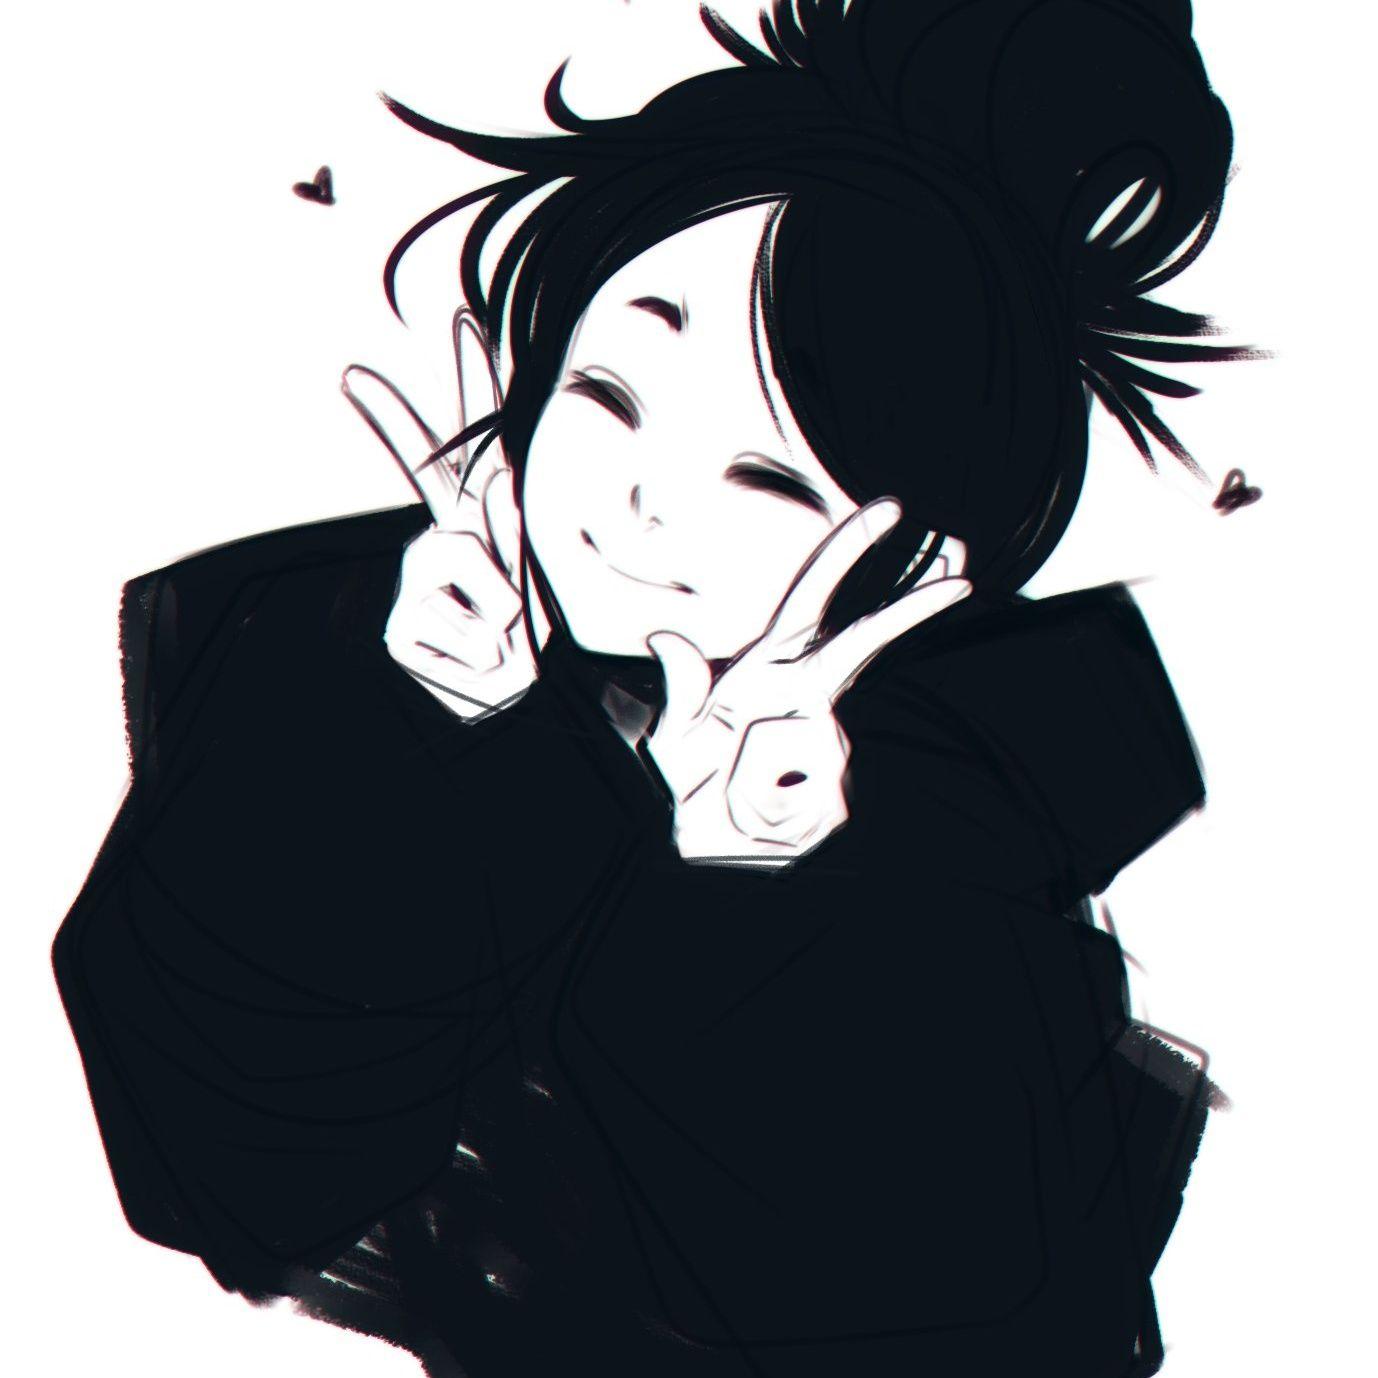 Pin on Anime ppl